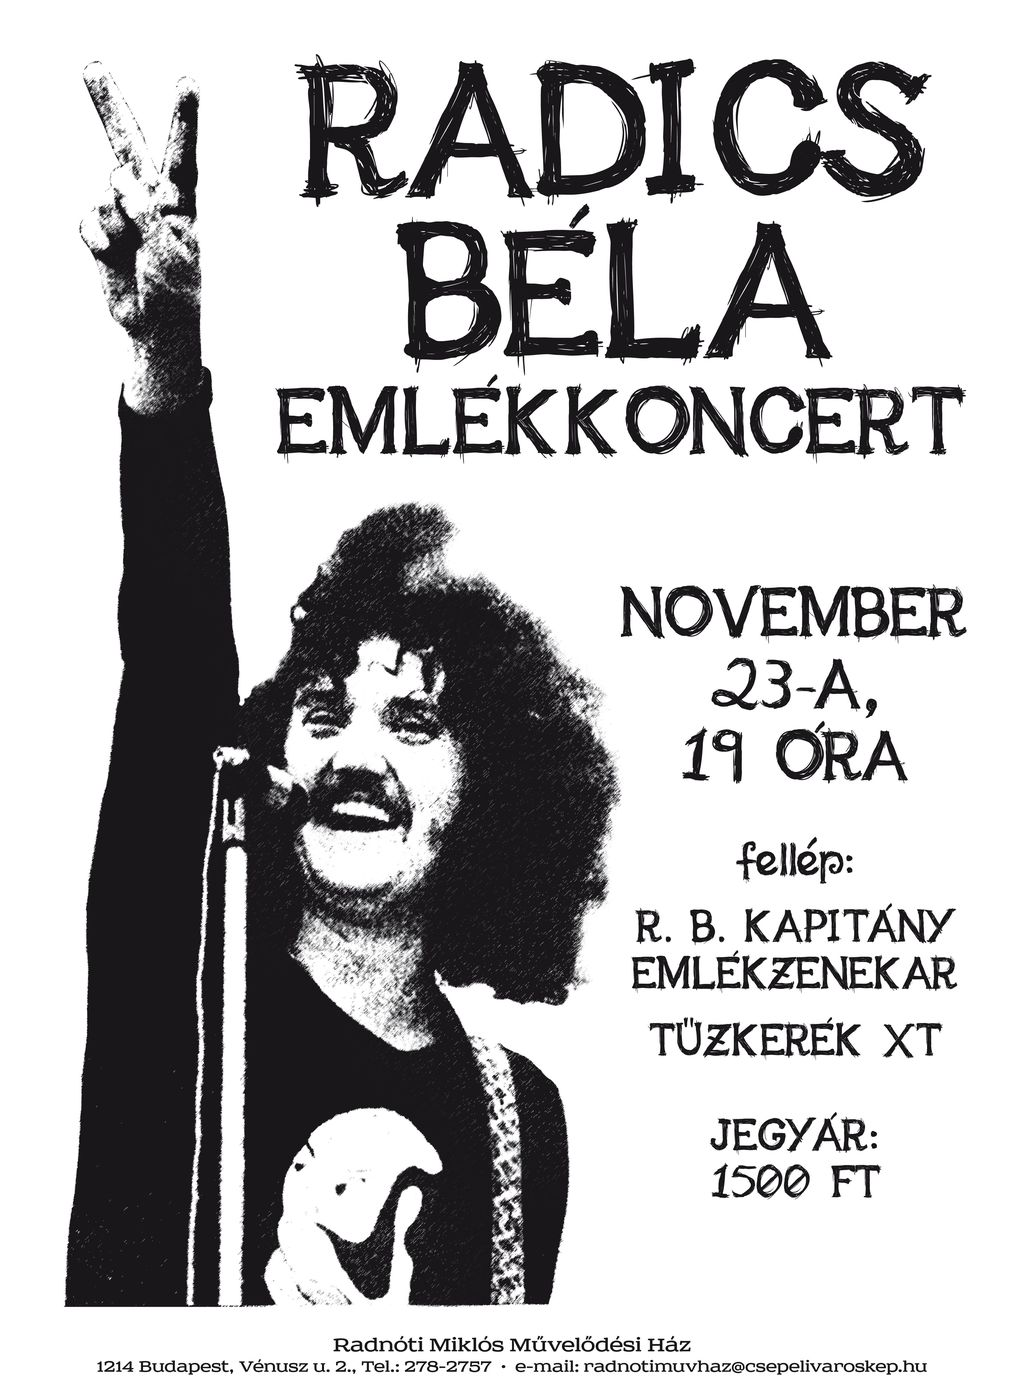 Radics Béla emlékkoncert